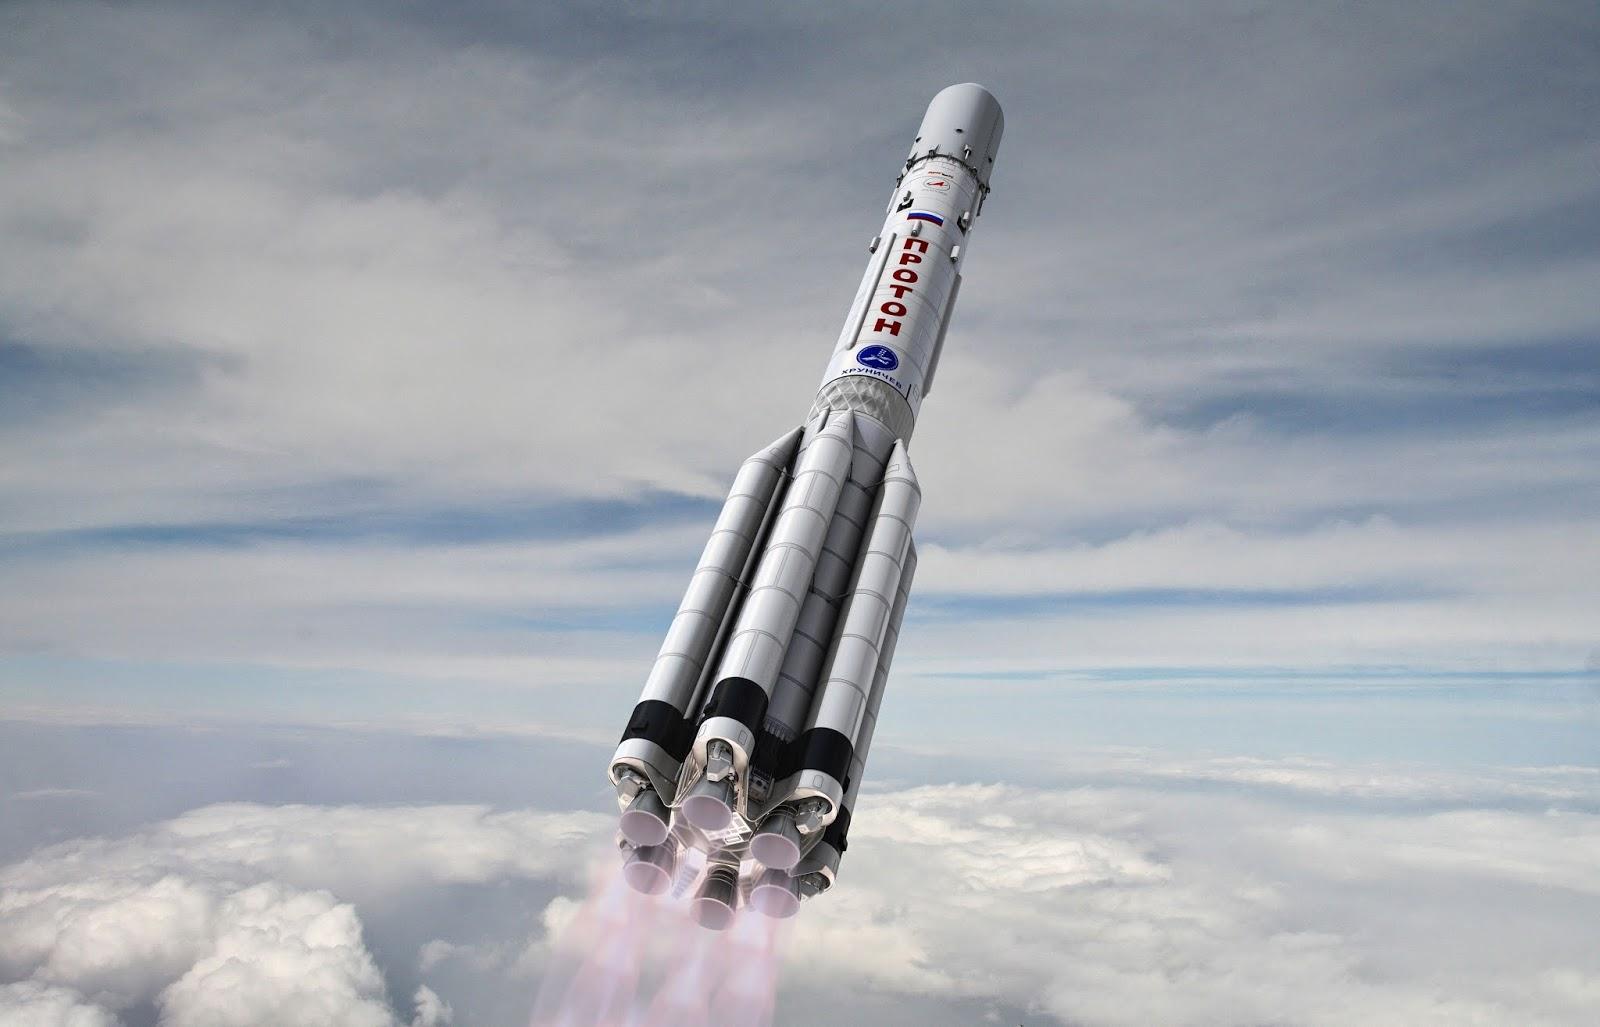 About the Angara rocket